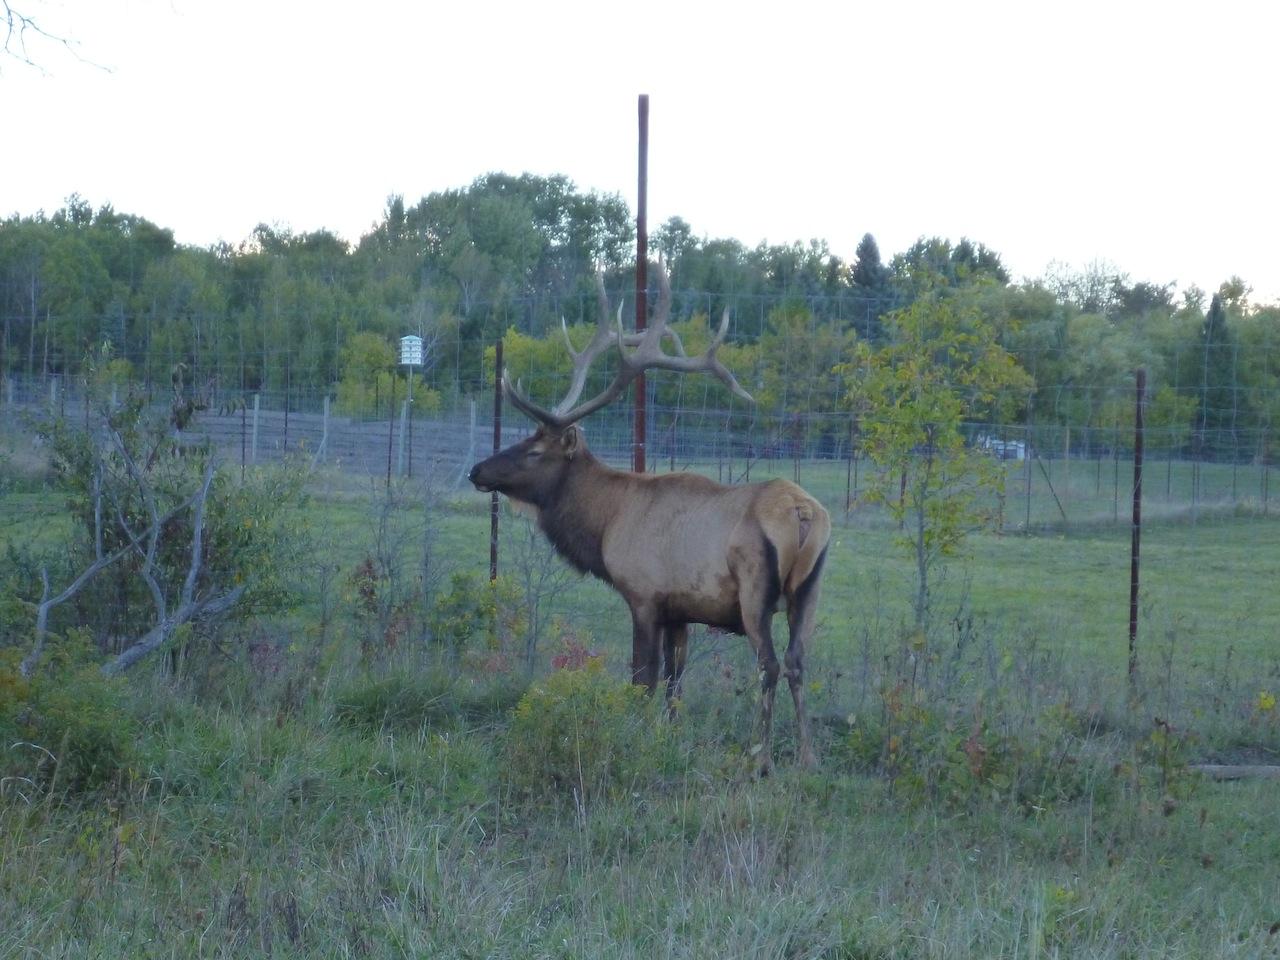 A Bull (Male) Elk